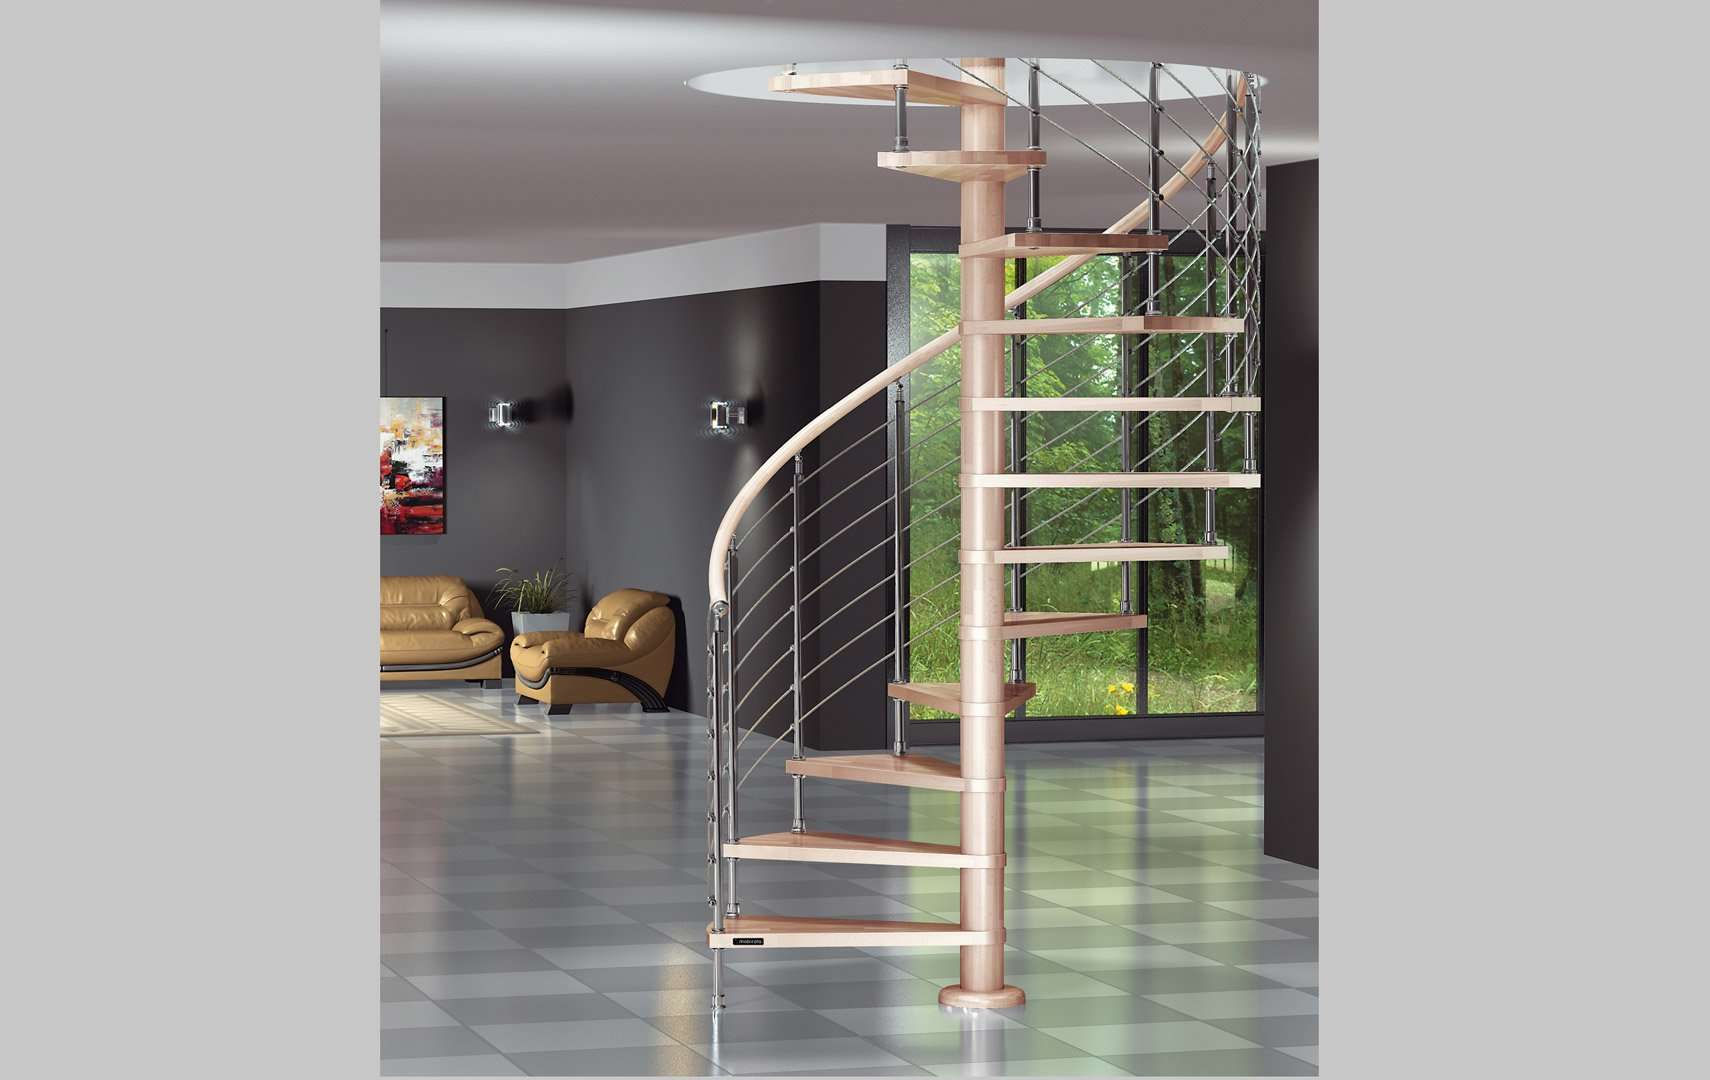 diable escaleras italianas escaleras de madera maciza escaleras para exteriores escaleras en metal escaleras escaleras de caracol